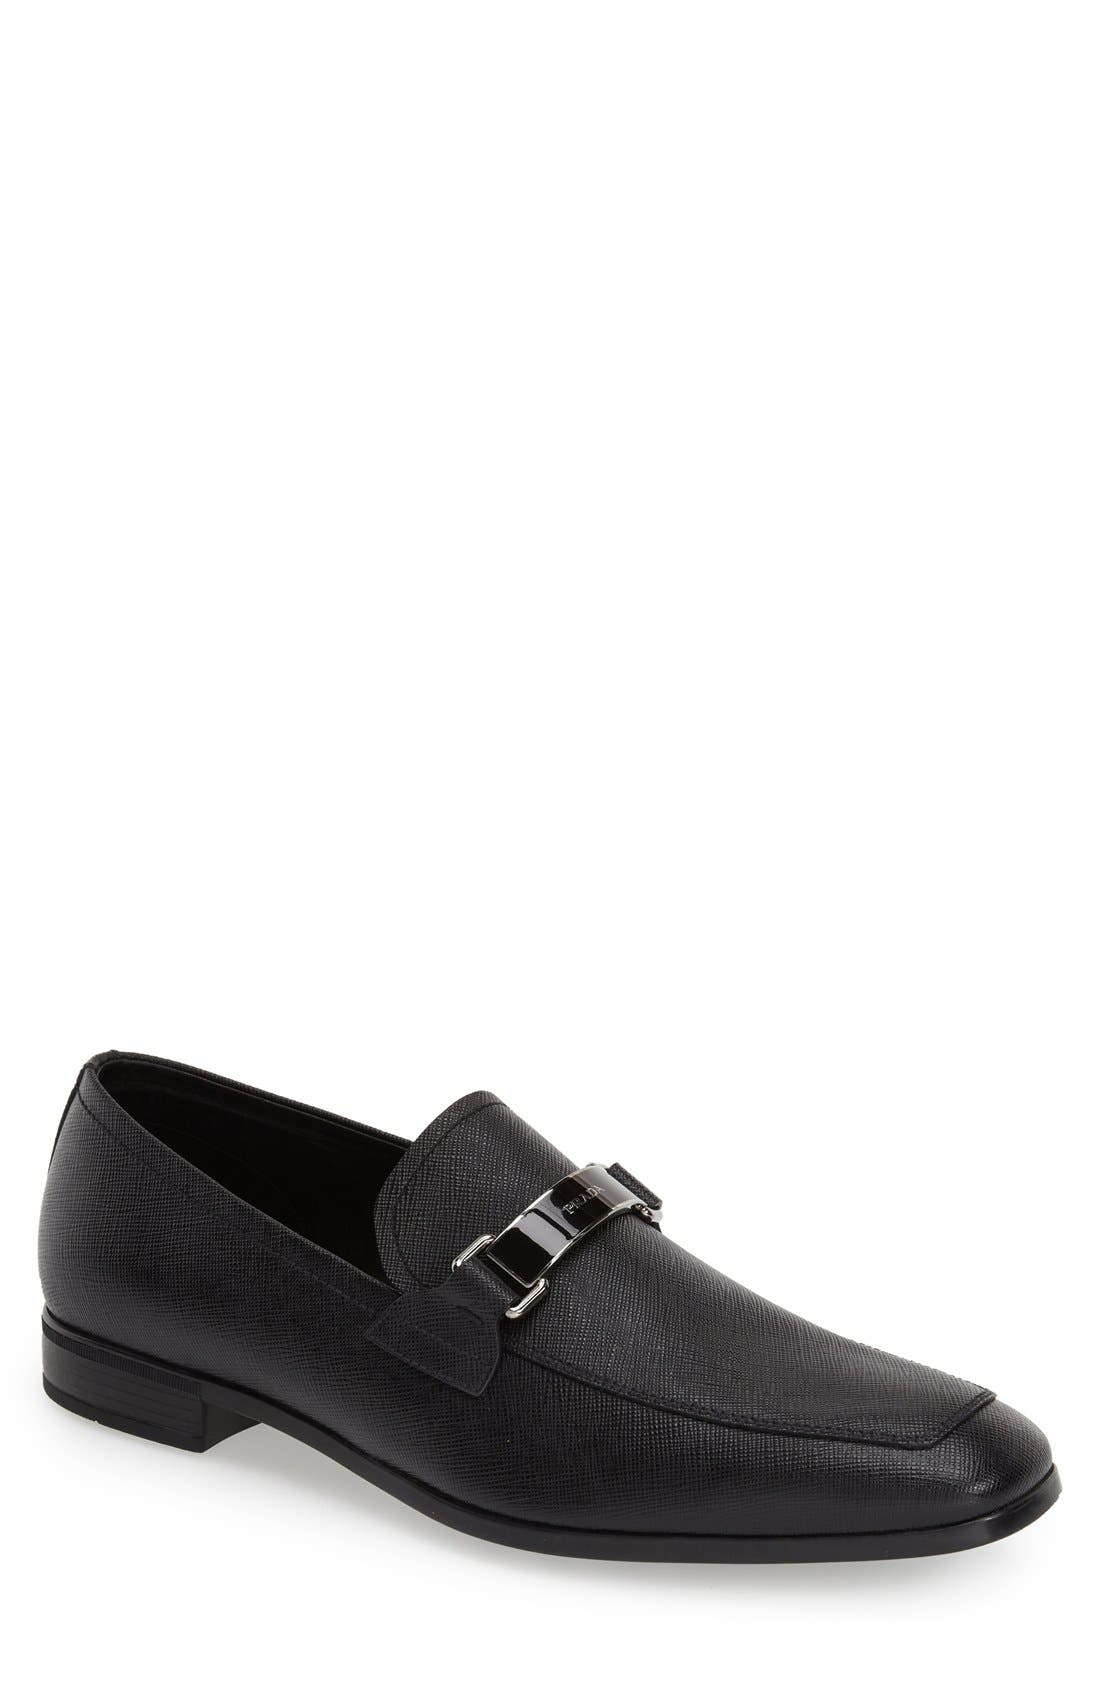 Prada Saffiano Leather Bit Loafer (Men)